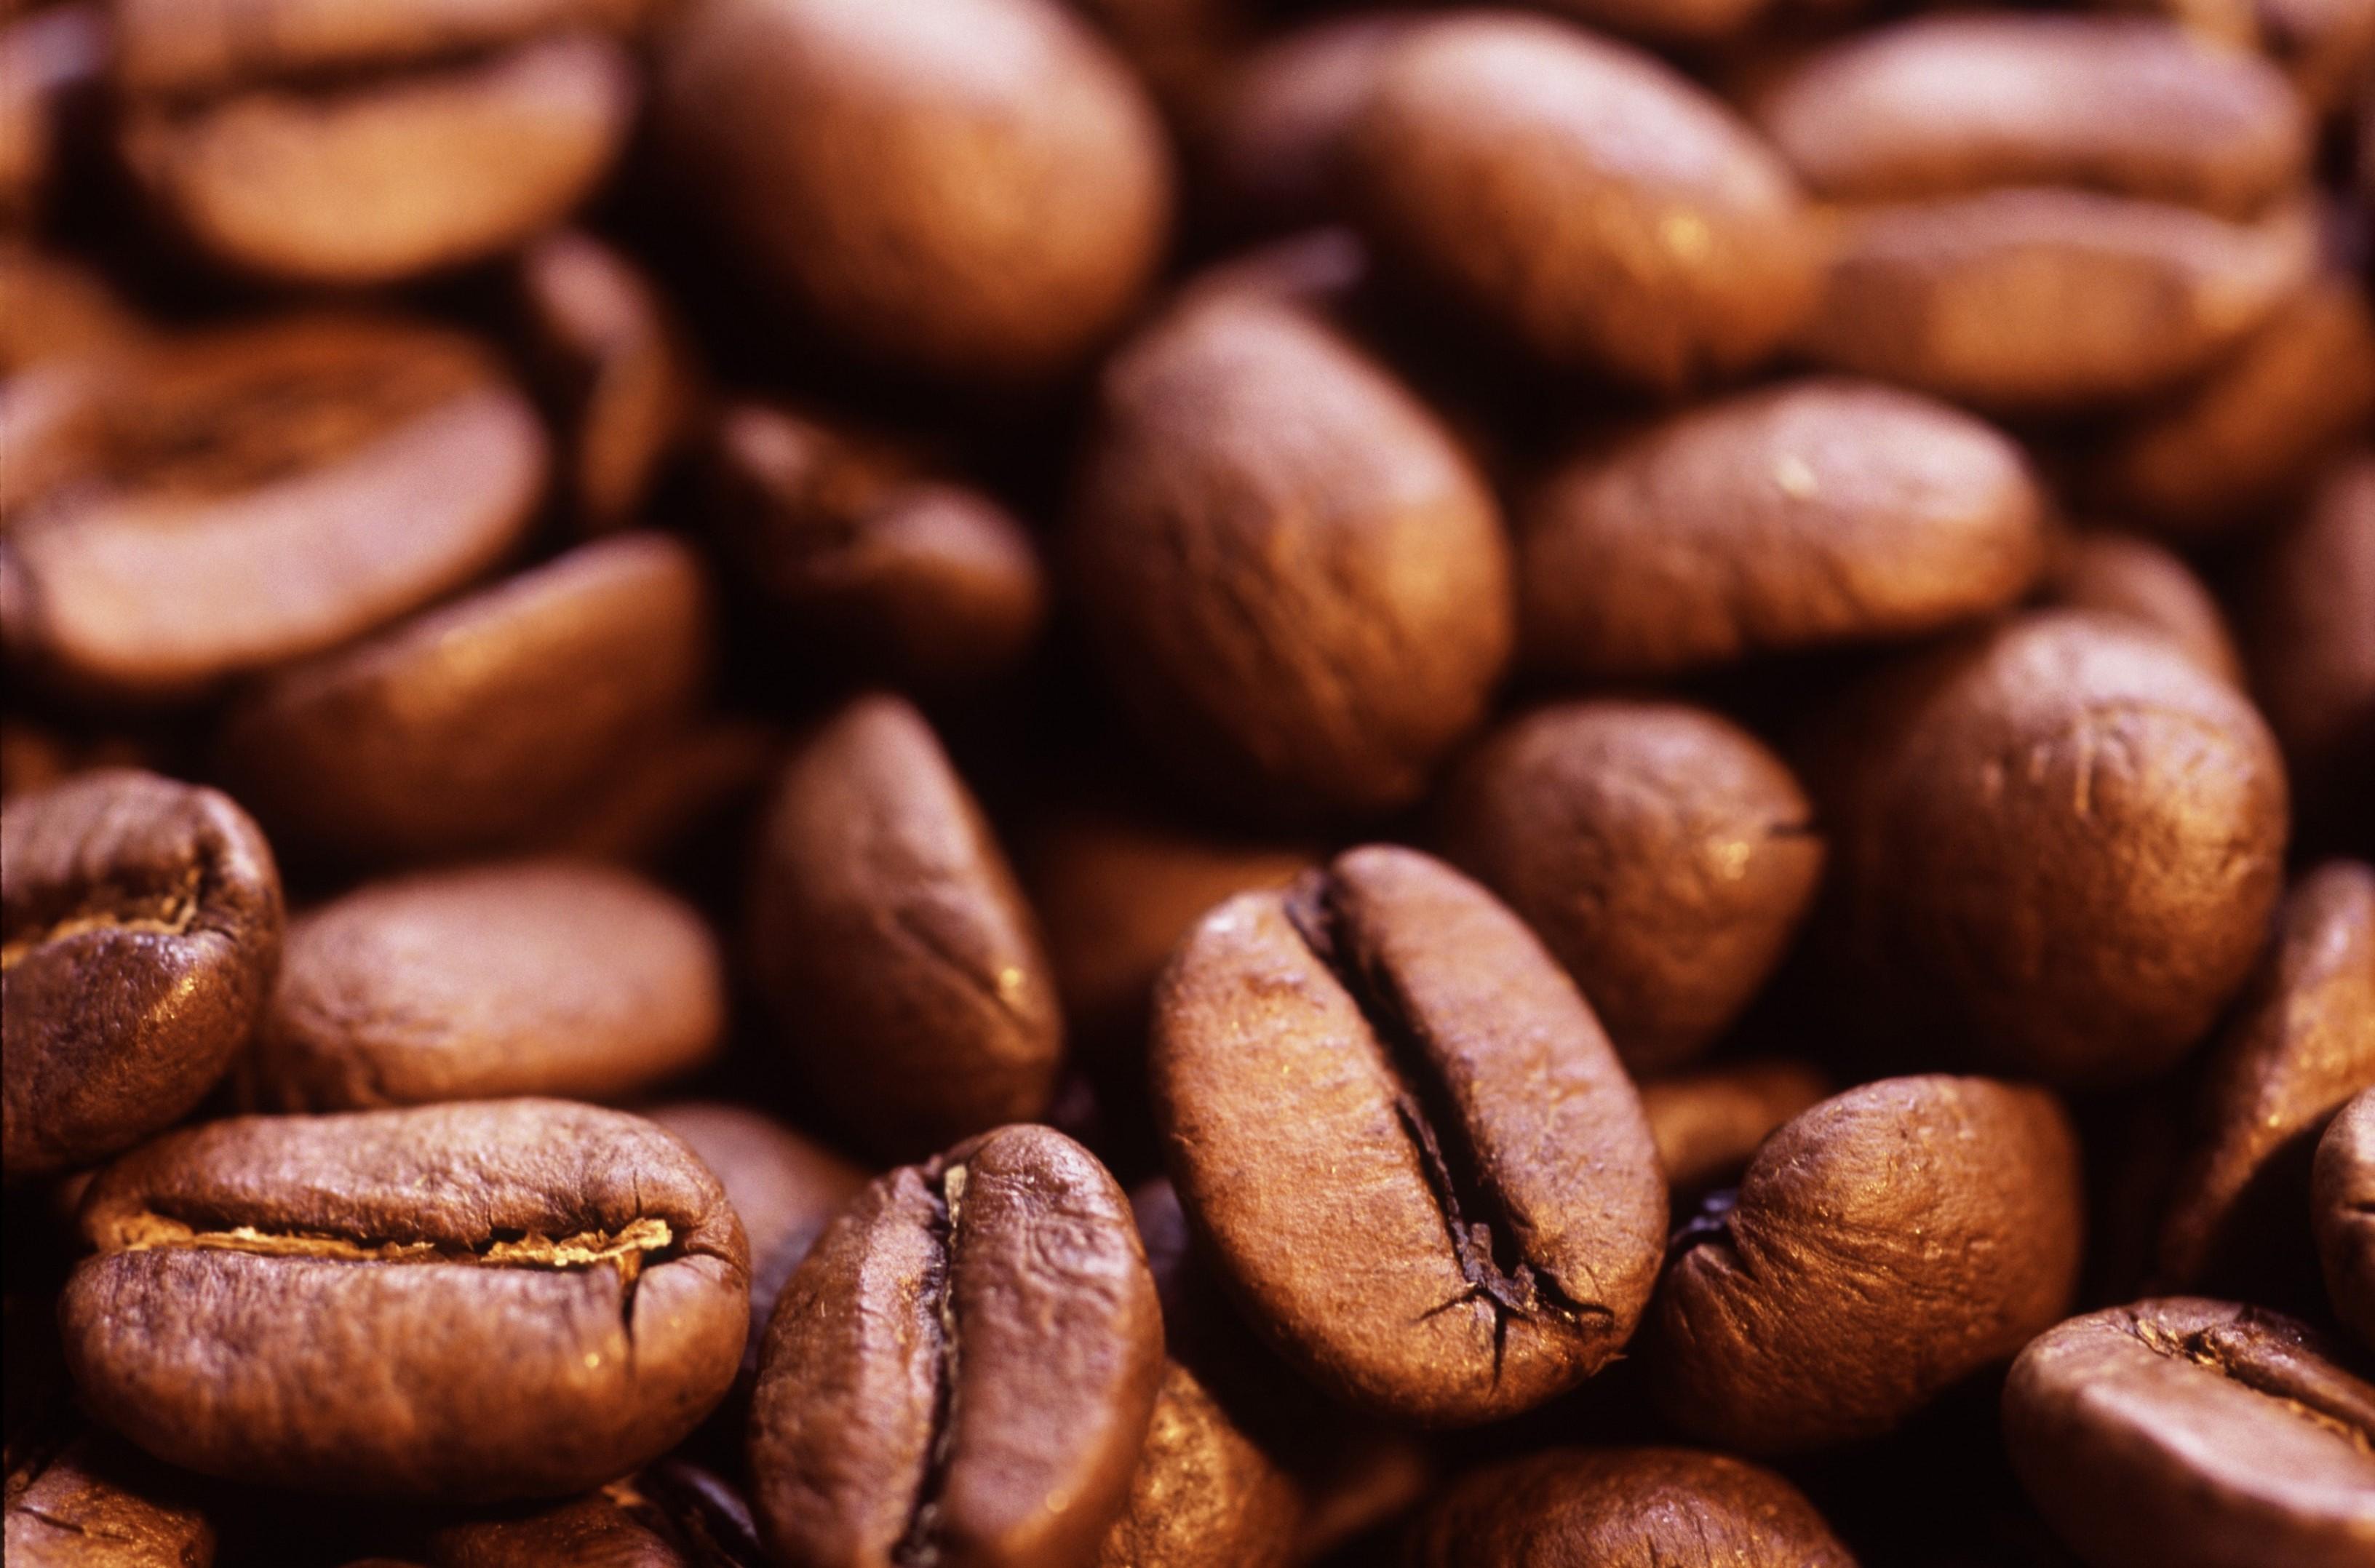 Free Stock photo of Roasted coffee beans | Stockmedia.cc